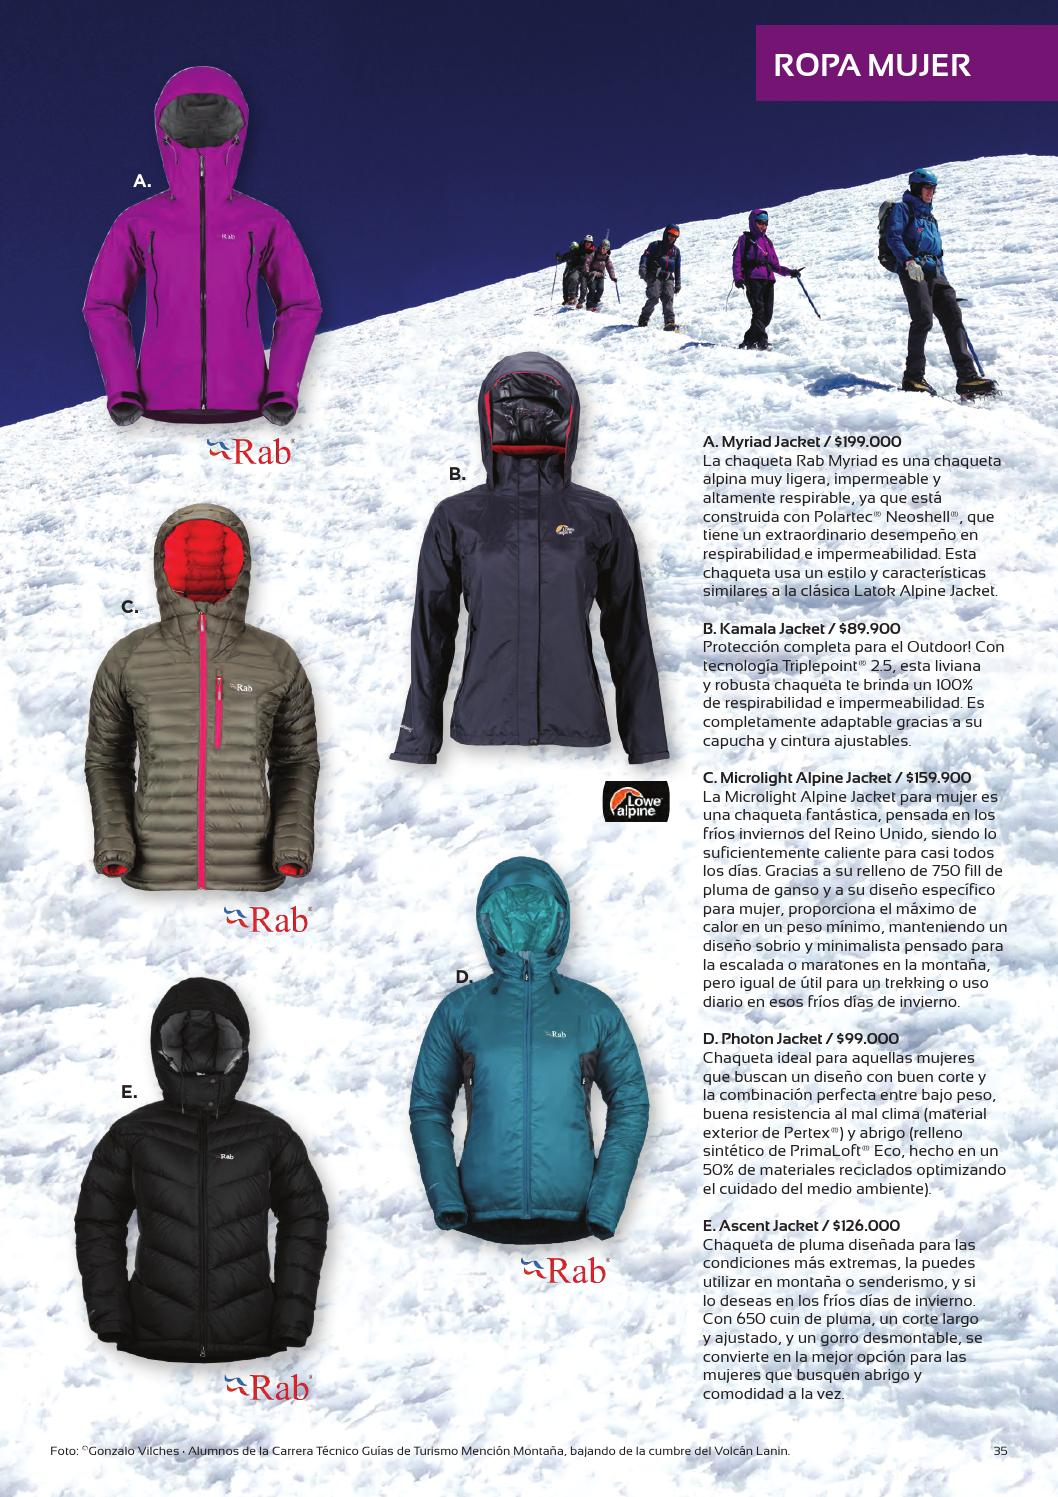 Invierno Catálogo Chile issuu Adventure by 2014 Tatoo Gear VLUqMpGSz